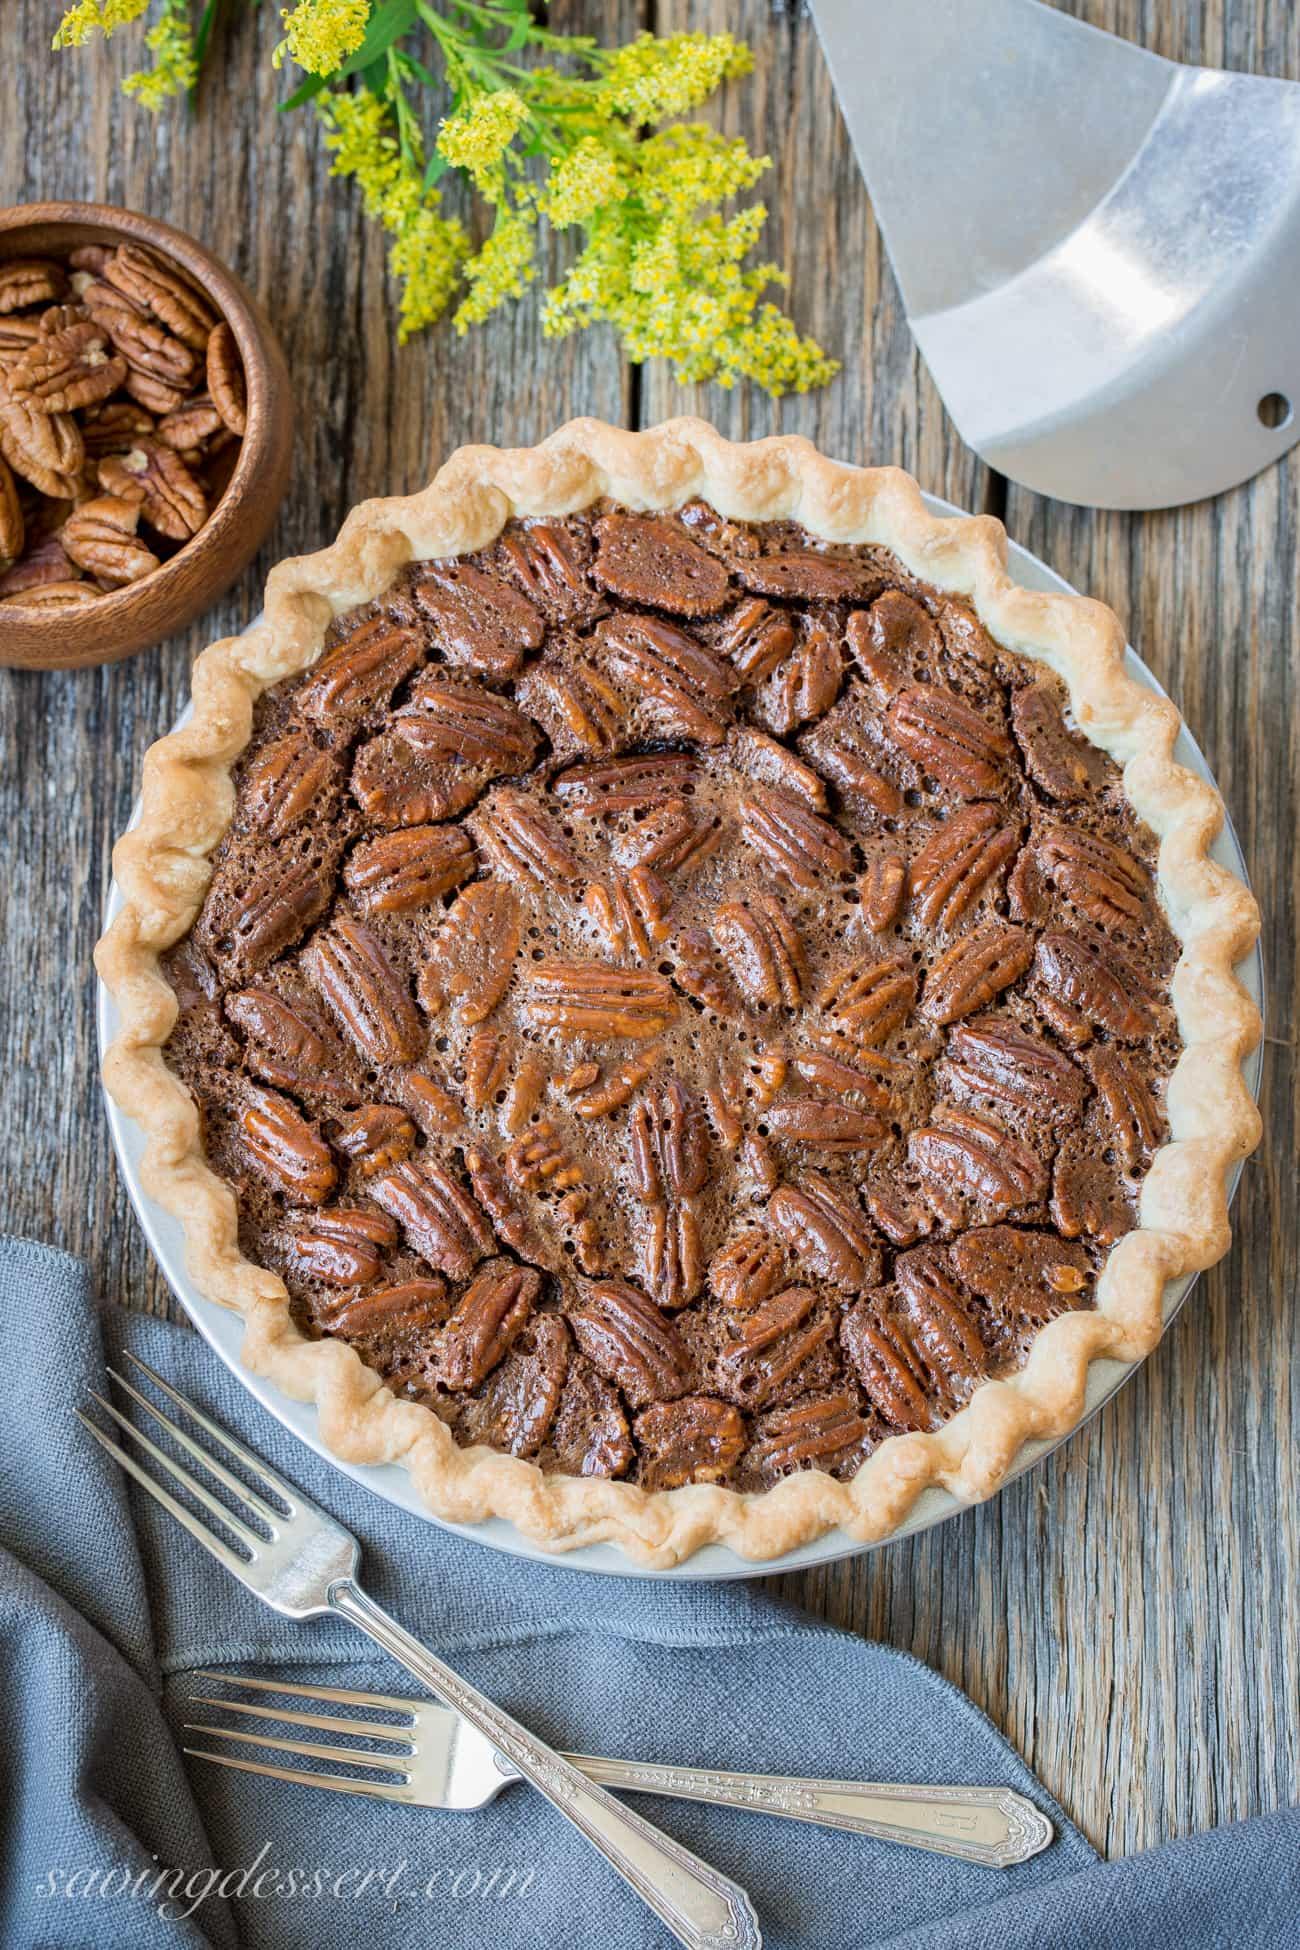 3. Chocolate Pecan Pie - Saving Room for Dessert